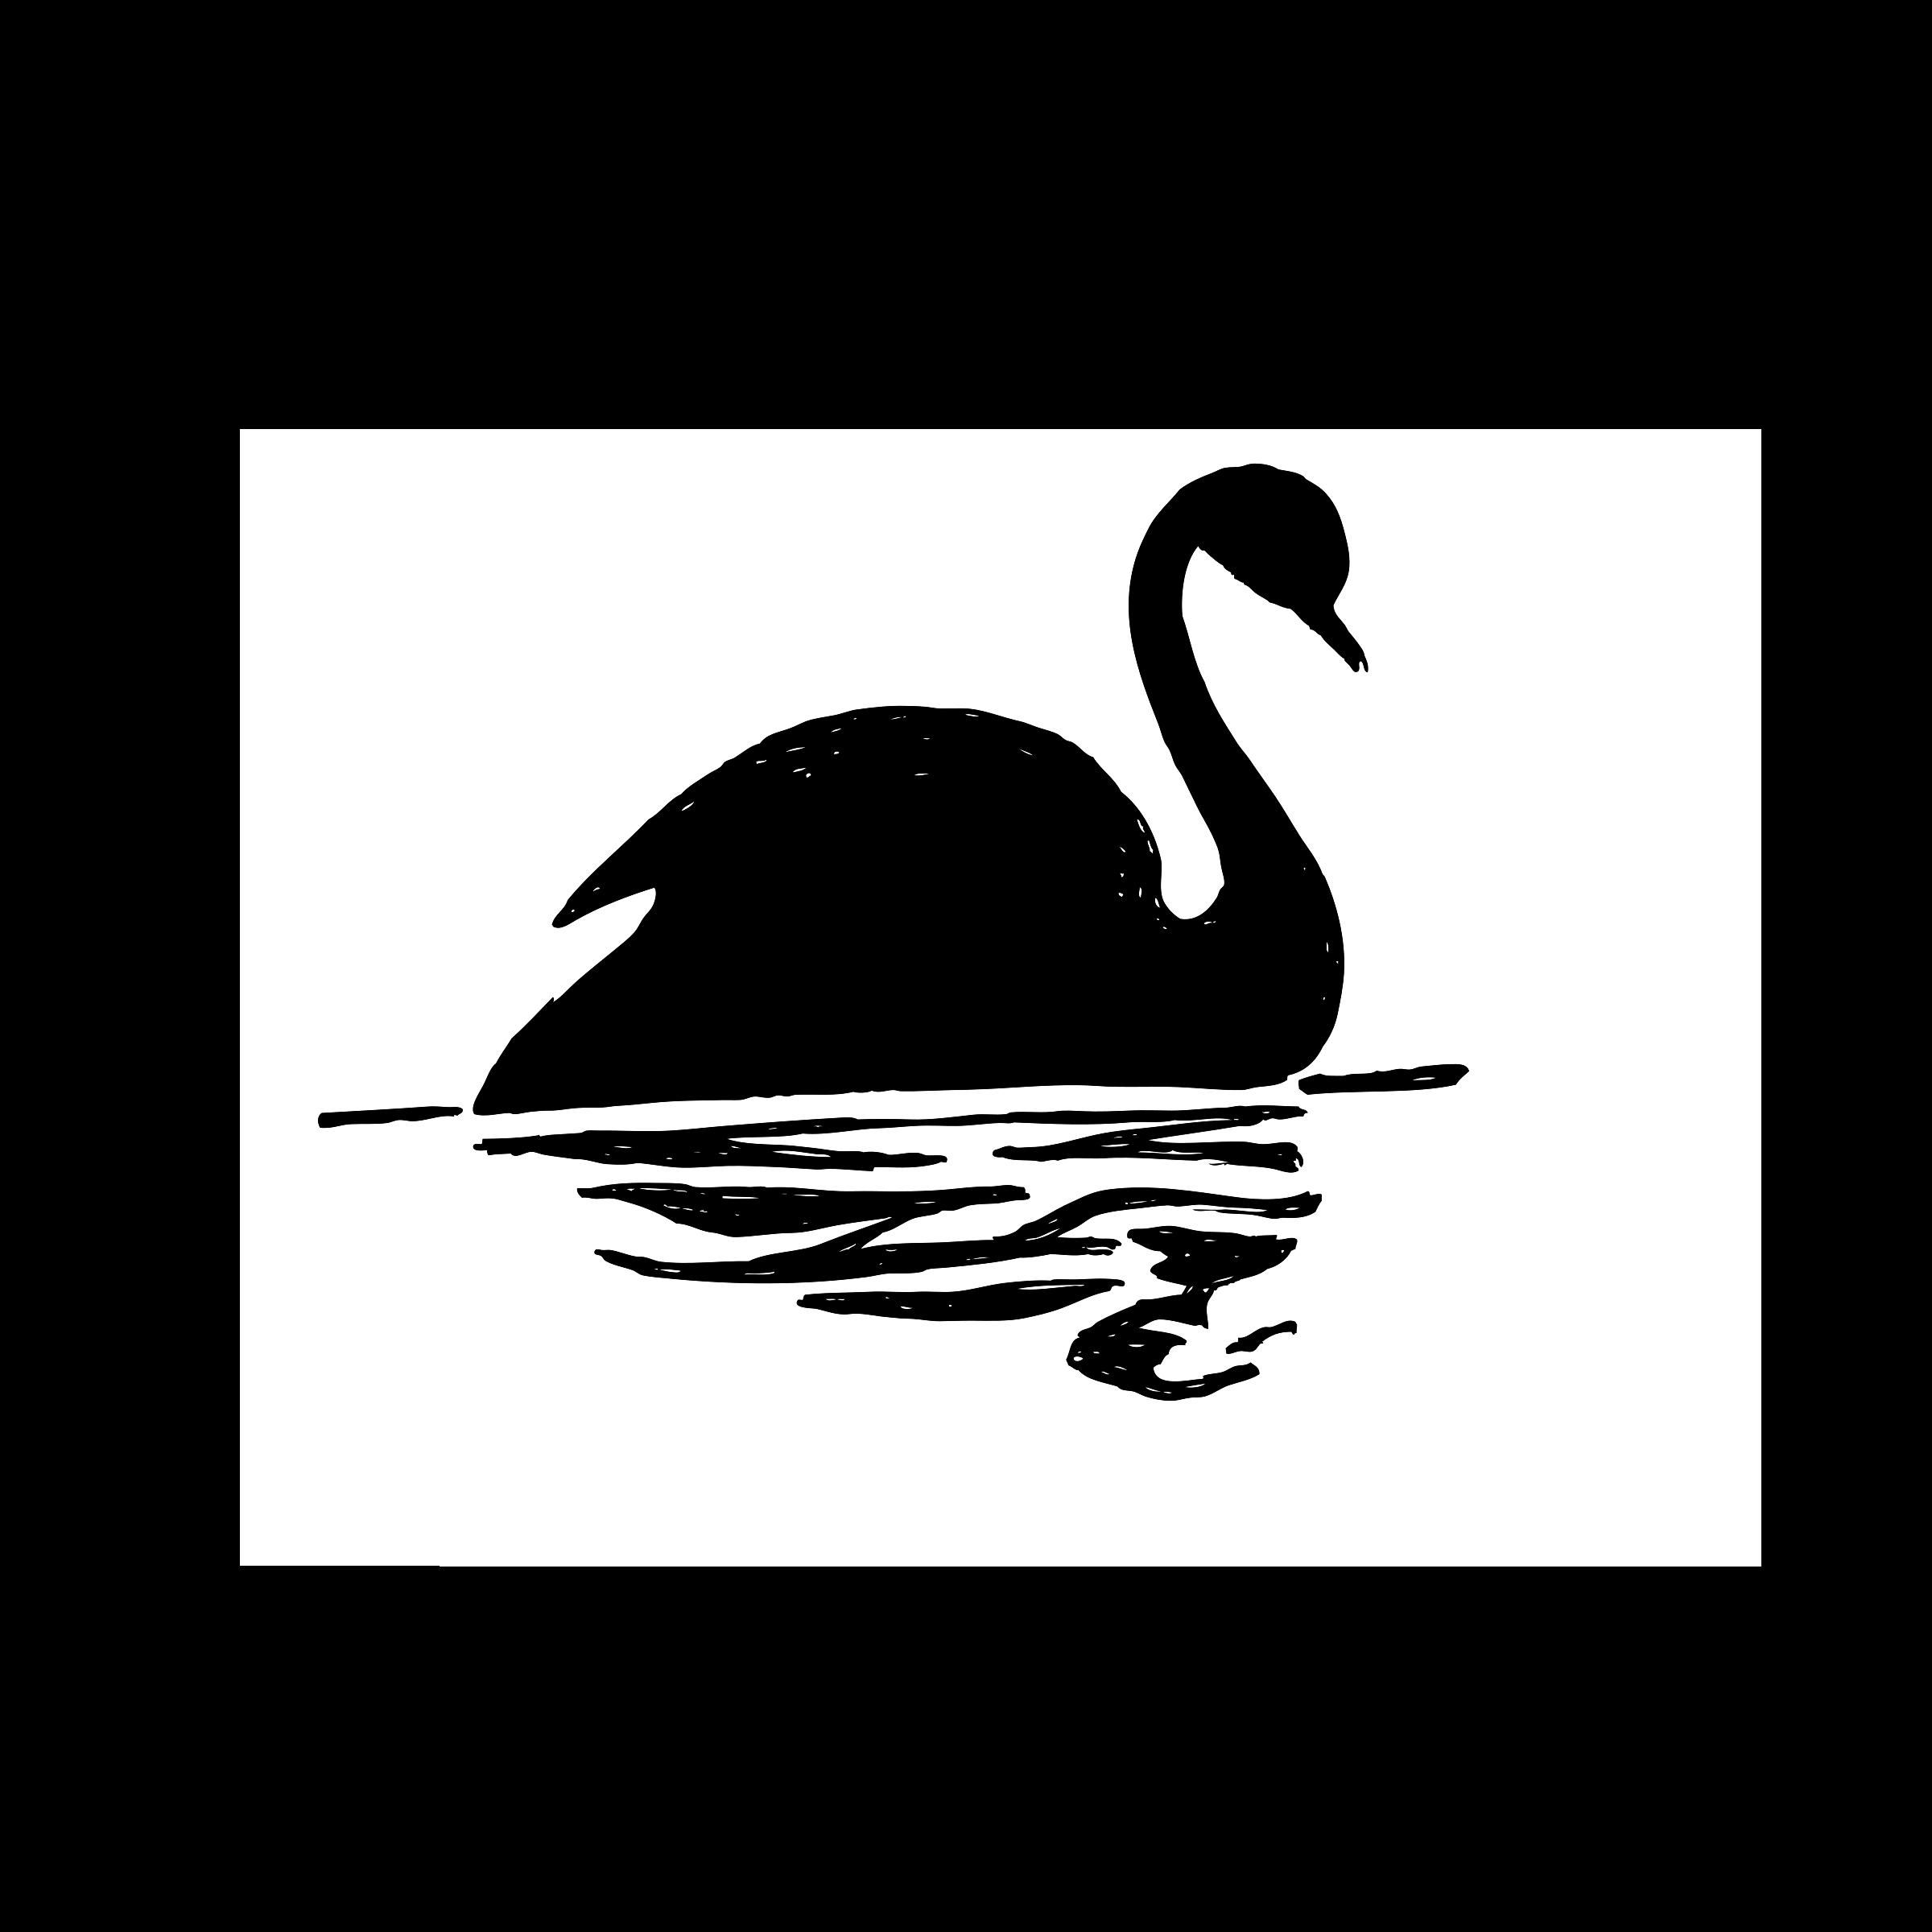 Clipart Black Swan.